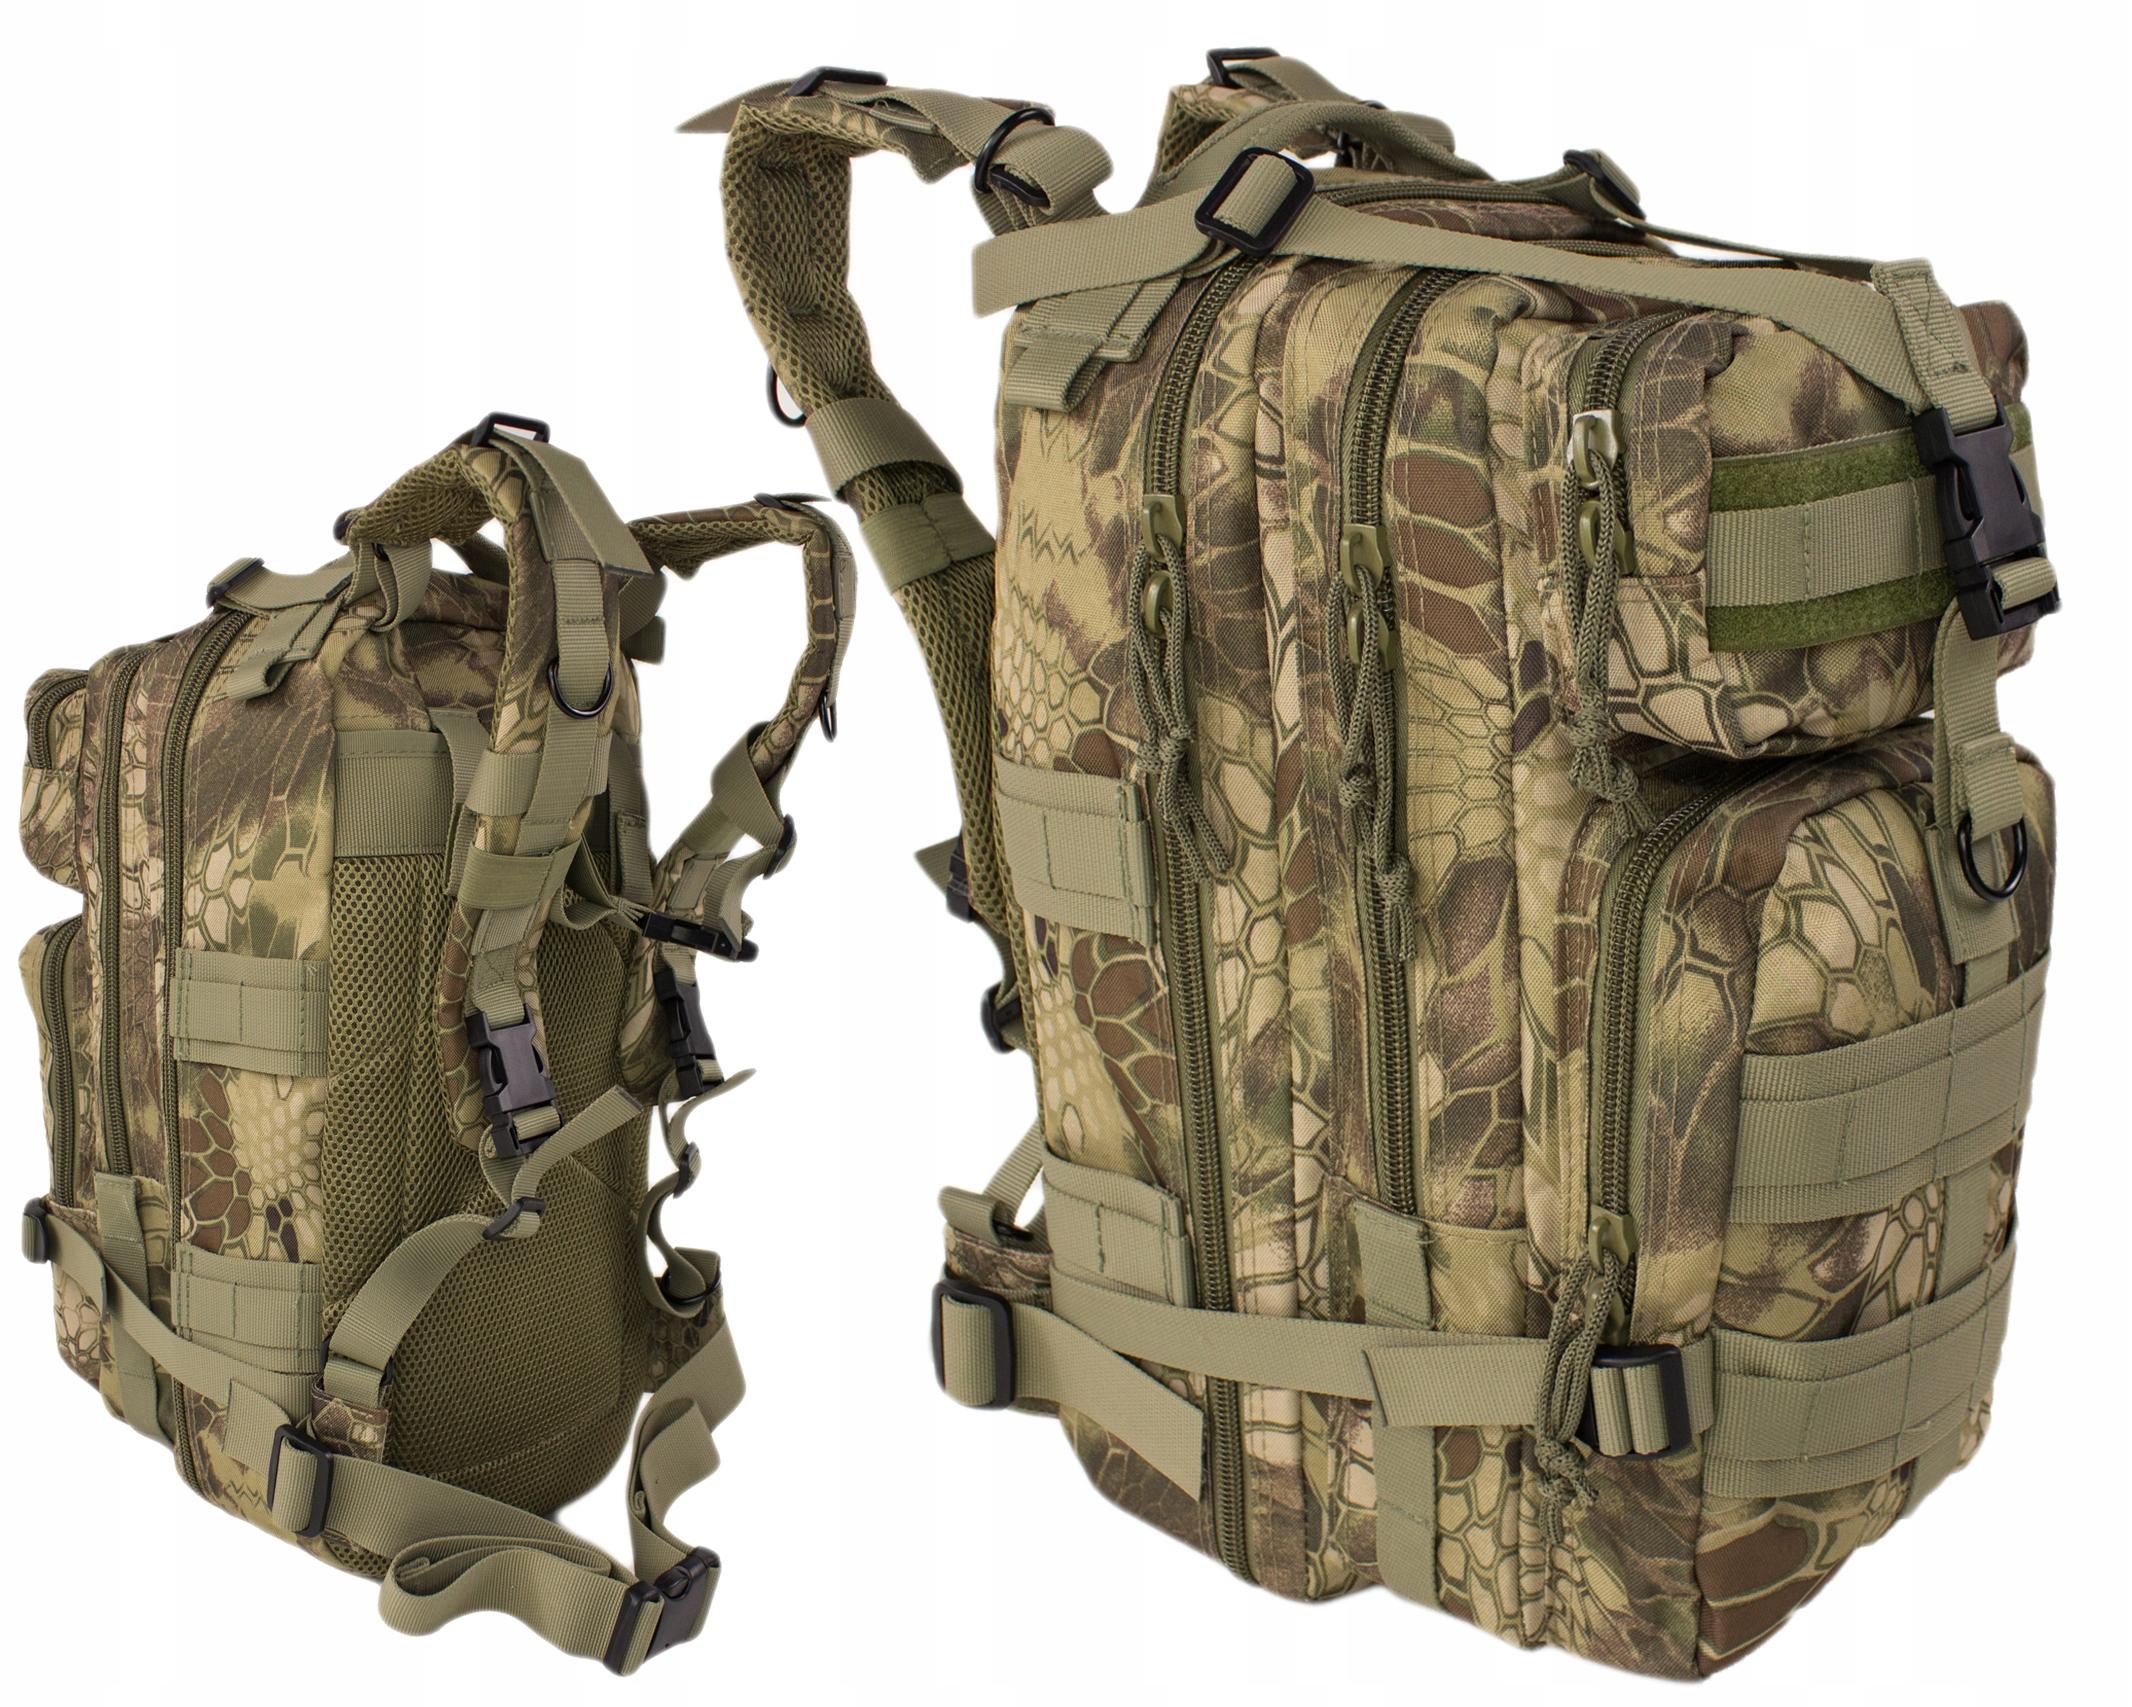 Turystyczny Plecak US ARMY Texar TXR Kryptek 25L